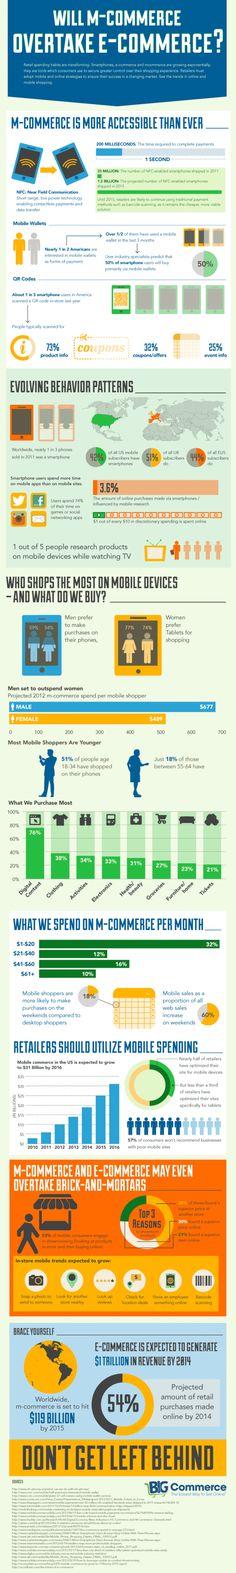 Will m-commerce overtake e-commerce?...